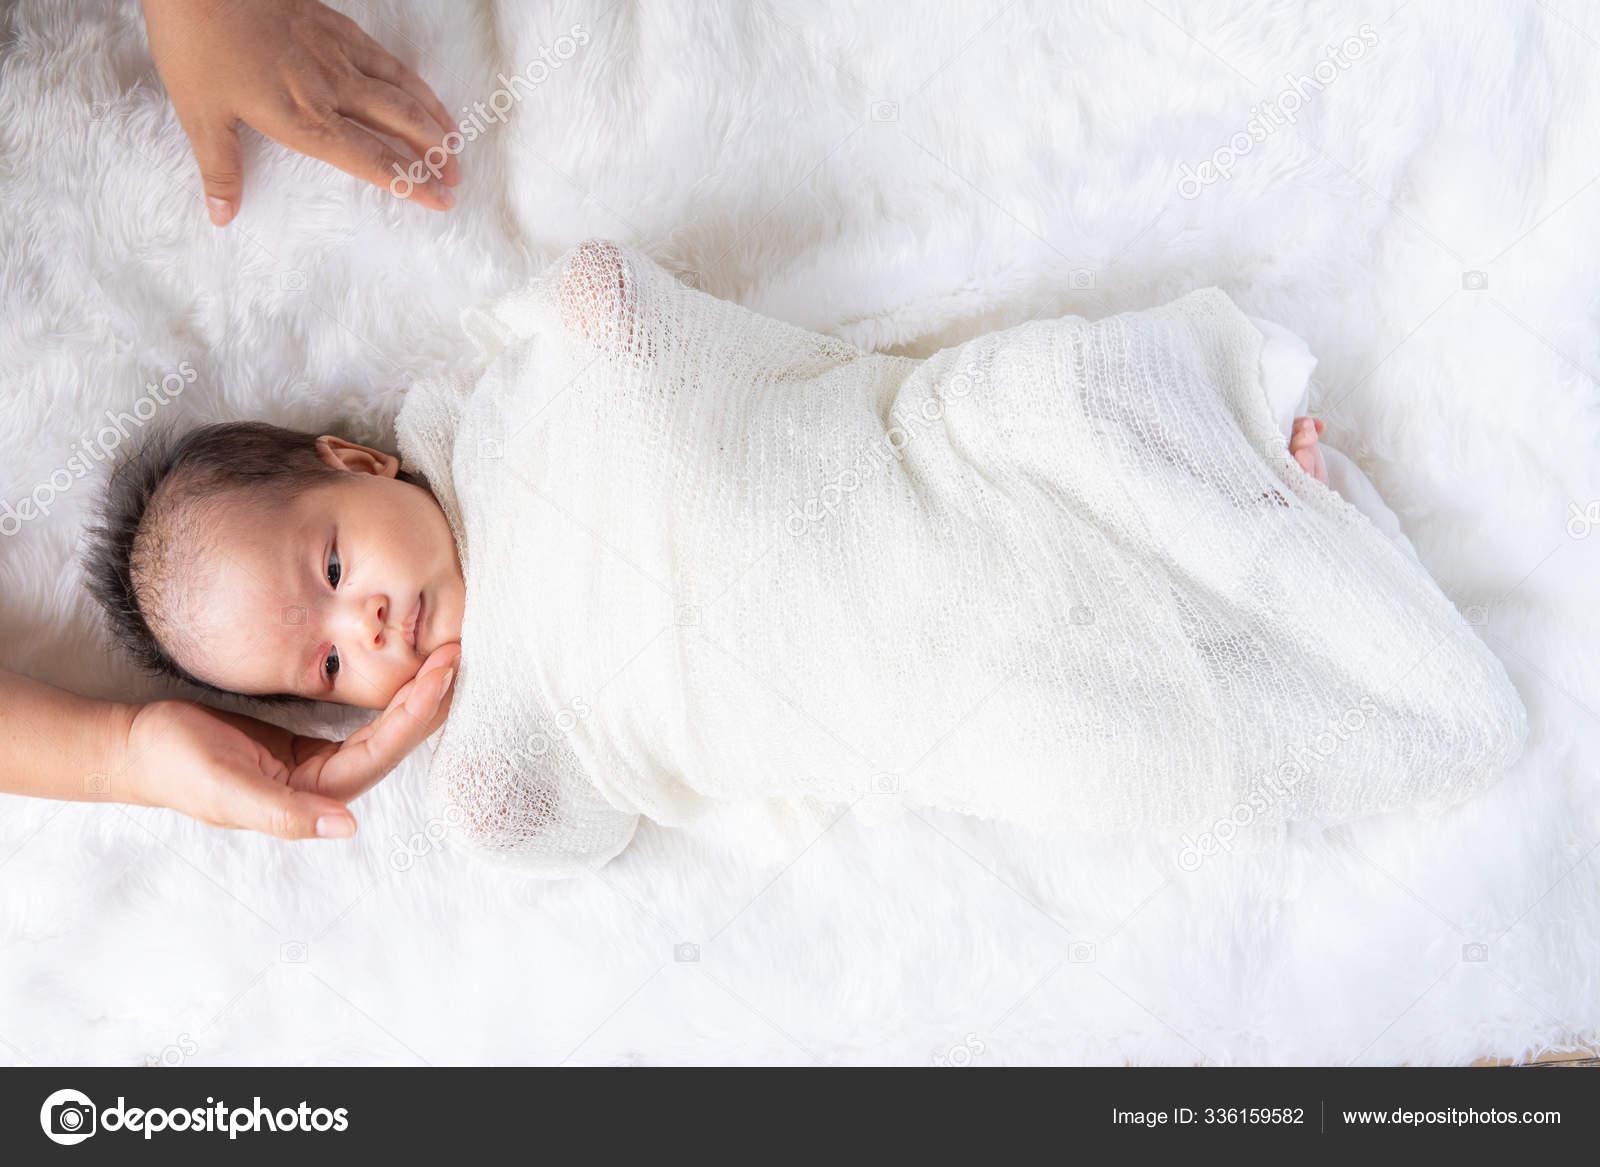 Cute Newborn Baby Girl White Blanket Nursery Bed Adorable New Stock Photo C Golfmhee 336159582